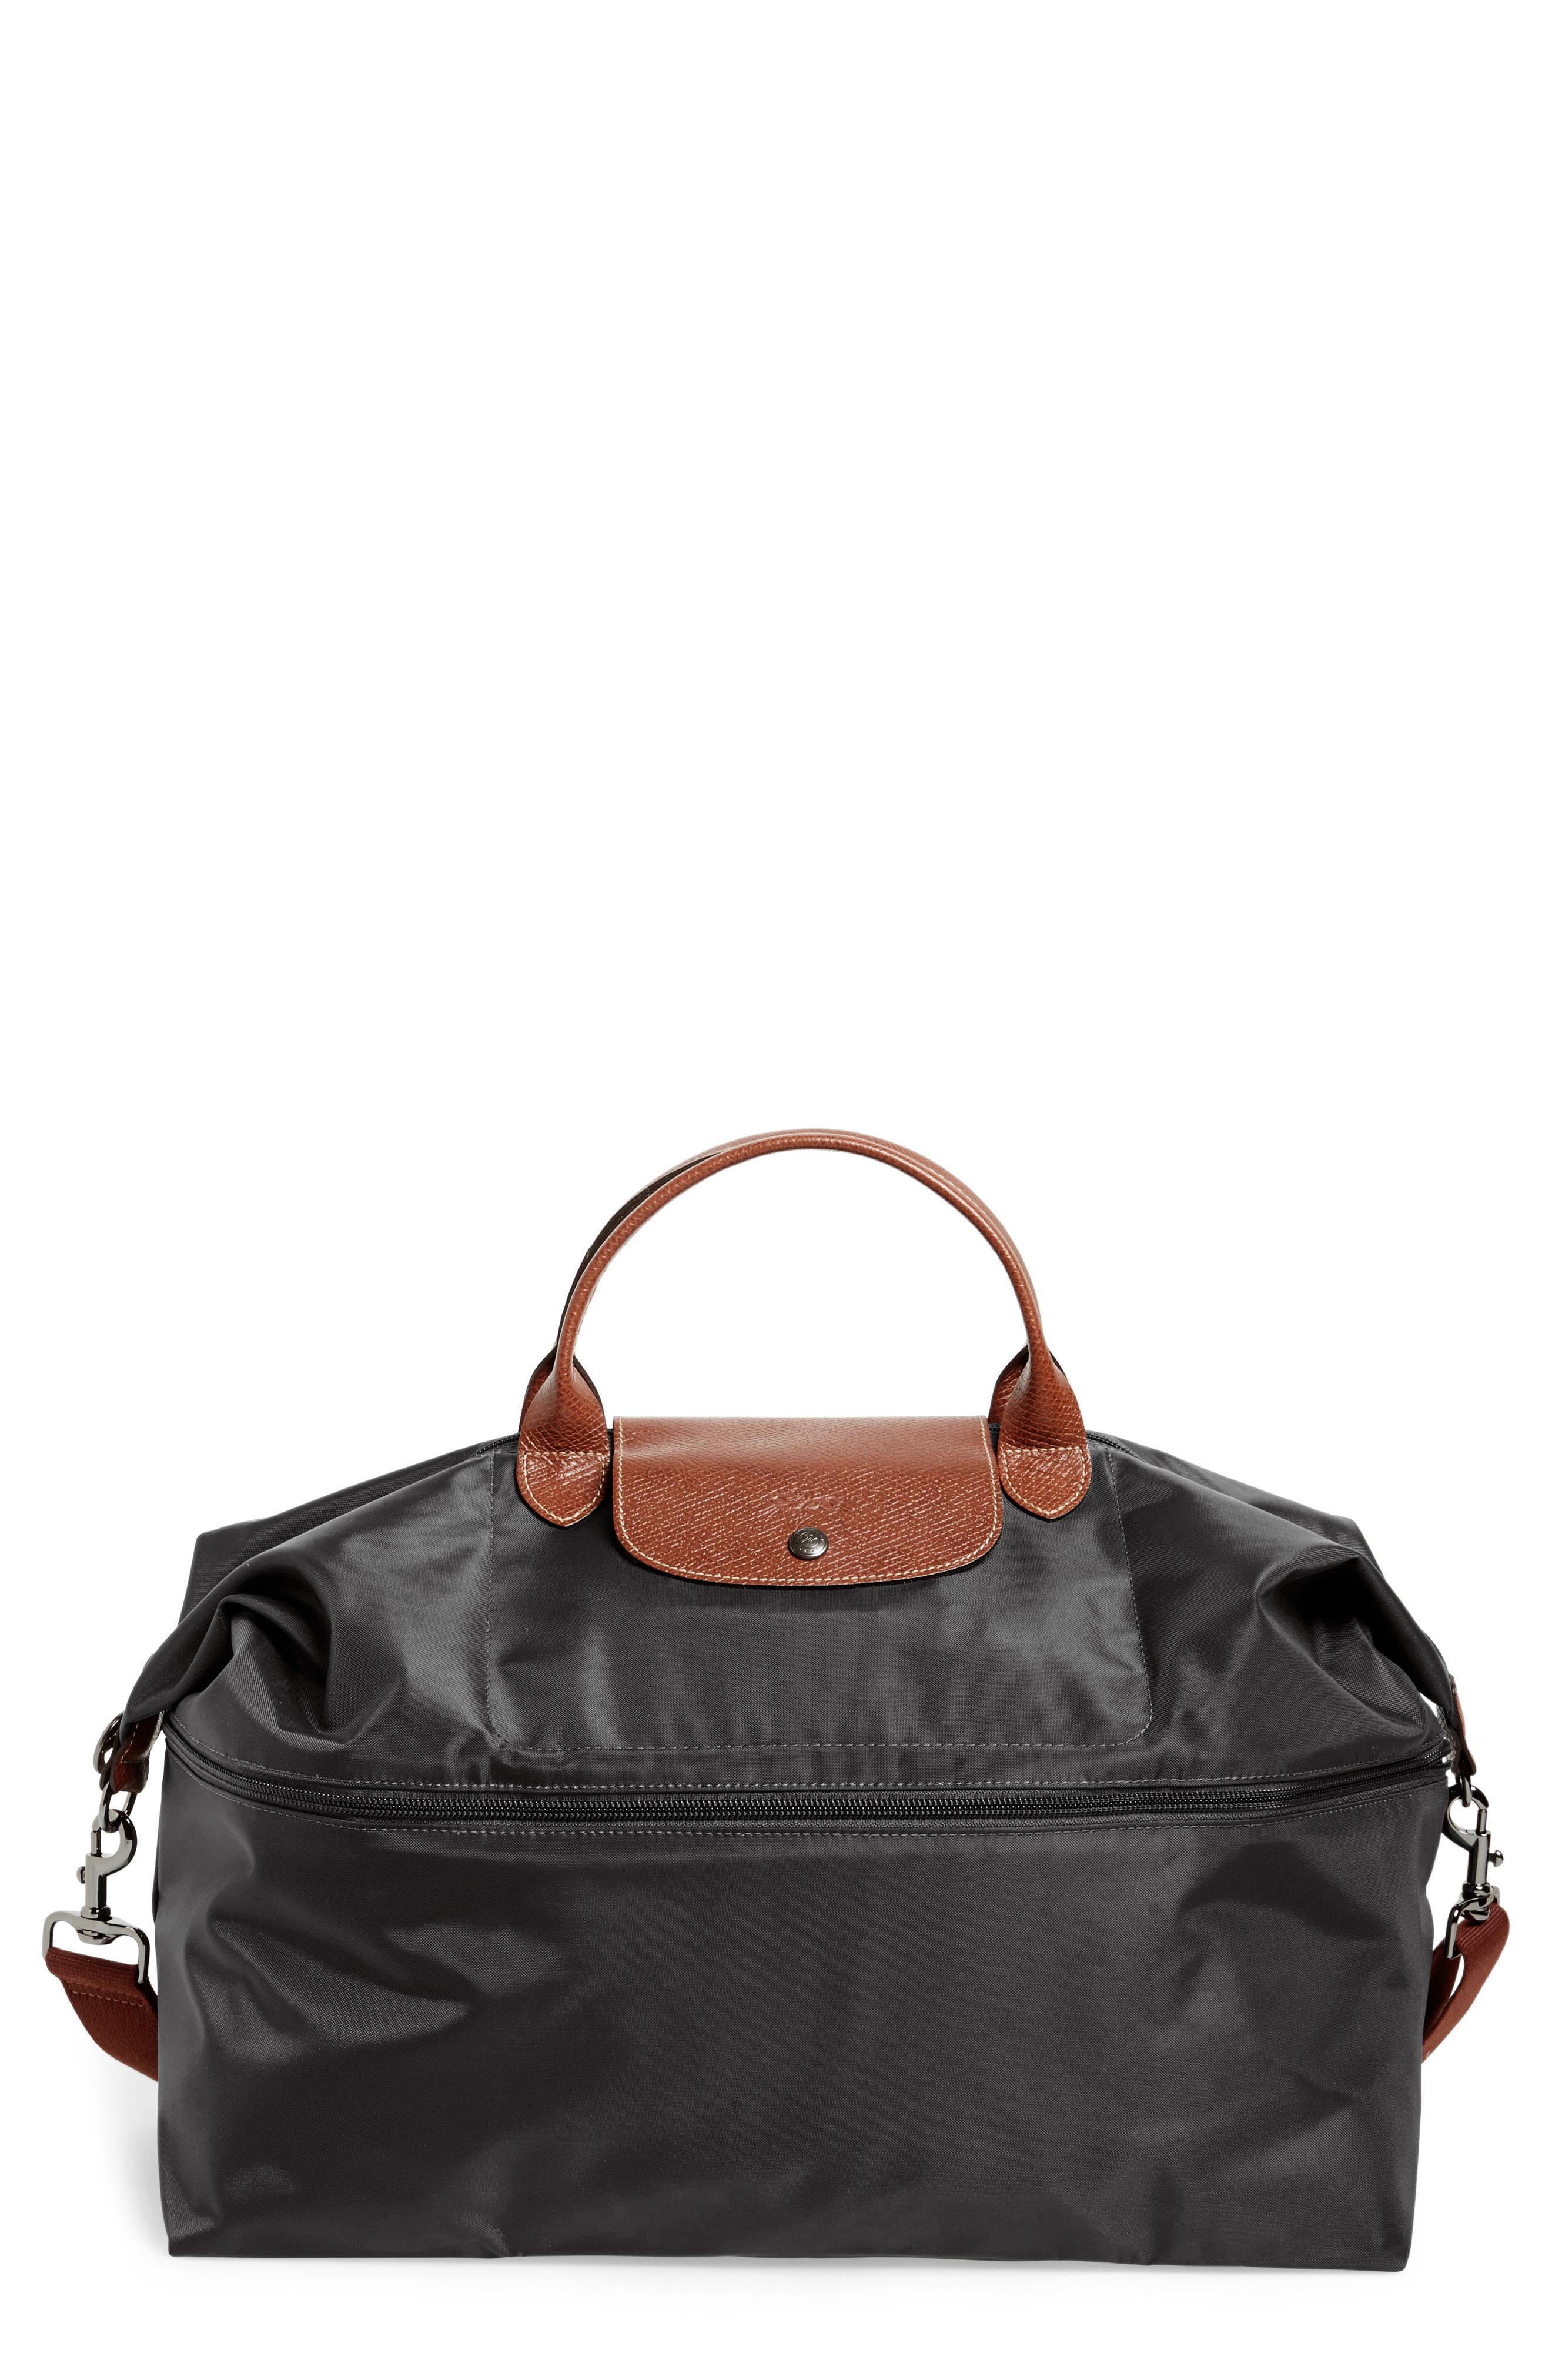 Lyst - Longchamp  le Pliage  Expandable Travel Bag in Black f64e3e5667771